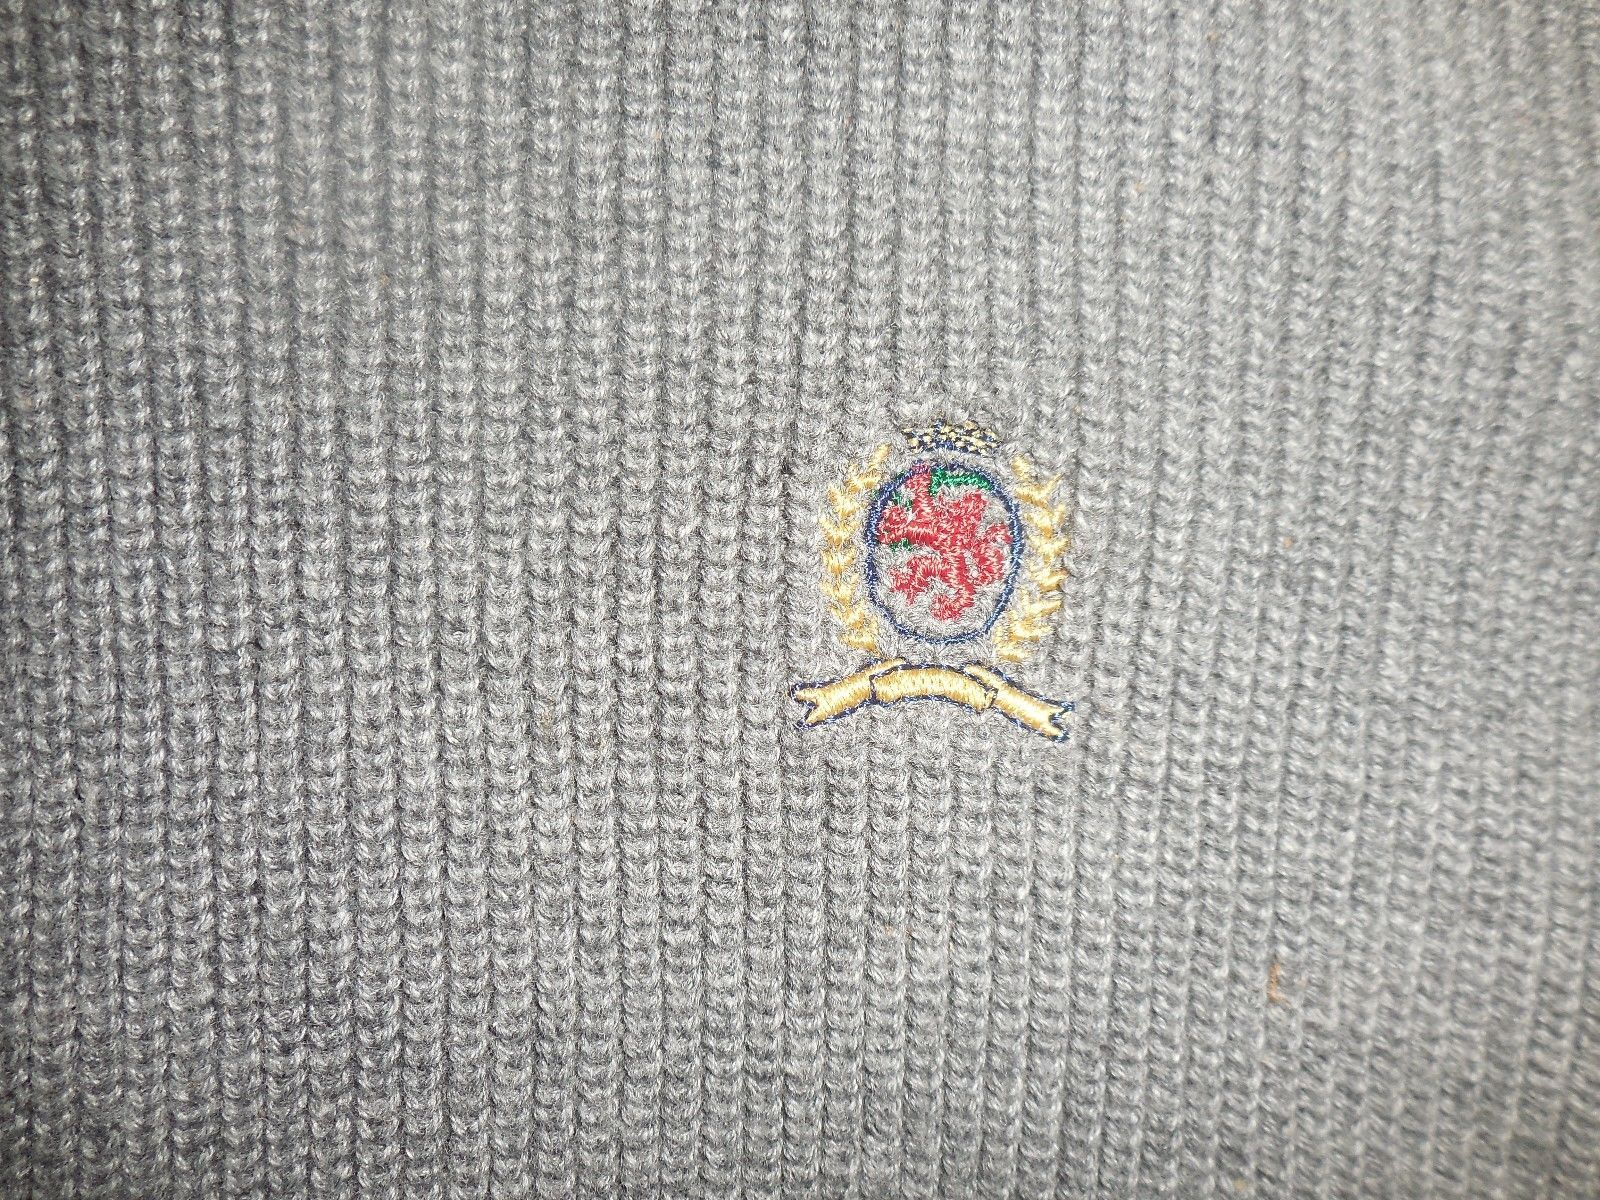 Tommy Hilfiger M Gray Knit V-Neck 100% Cotton Pullover Sleeveless Sweater Vest image 5